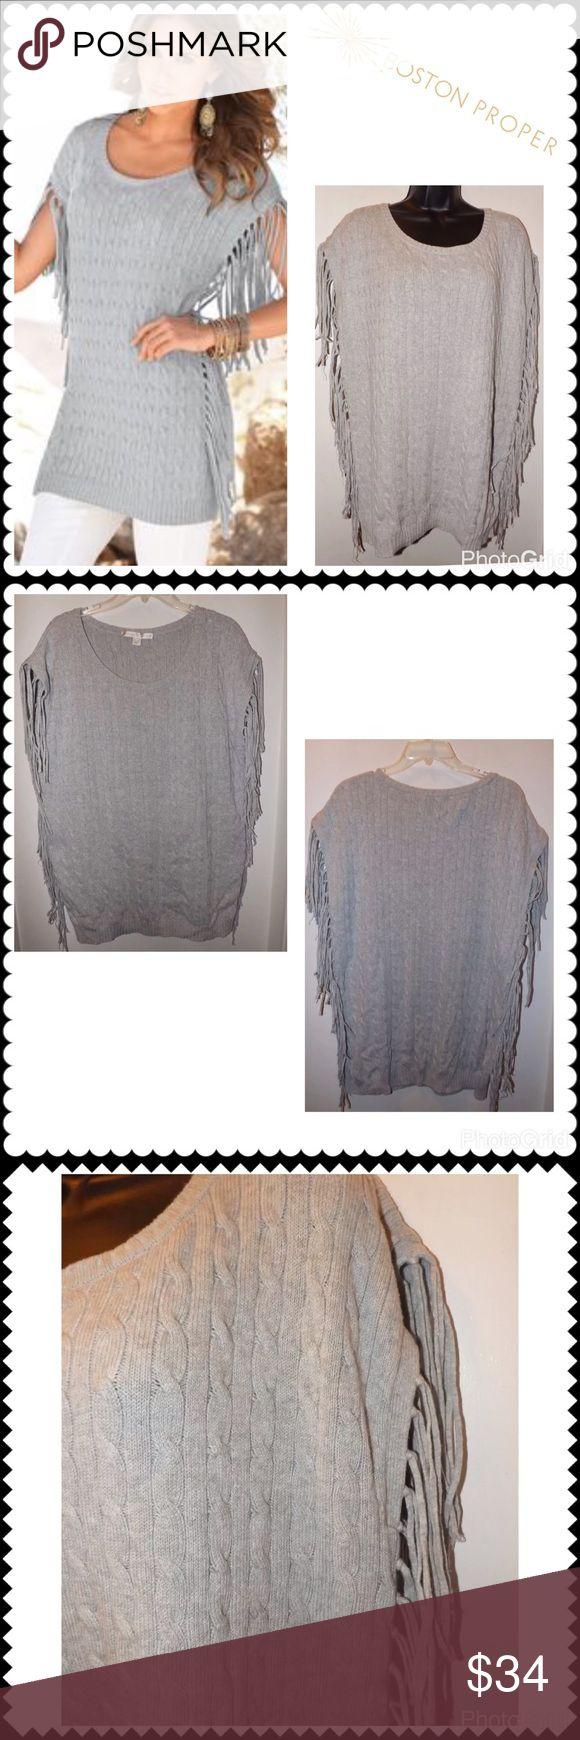 "BOSTON PROPER Cable Fringe Tunic Sweater Sz Medium Gray Cableknit Sweater by BOSTON PROPER. Sleeveless. Fringe down both sides. Cotton Blend. Cute! Sz Medium (22.5"" across chest, 29"" Shoulder to hem) Boston Proper Sweaters"